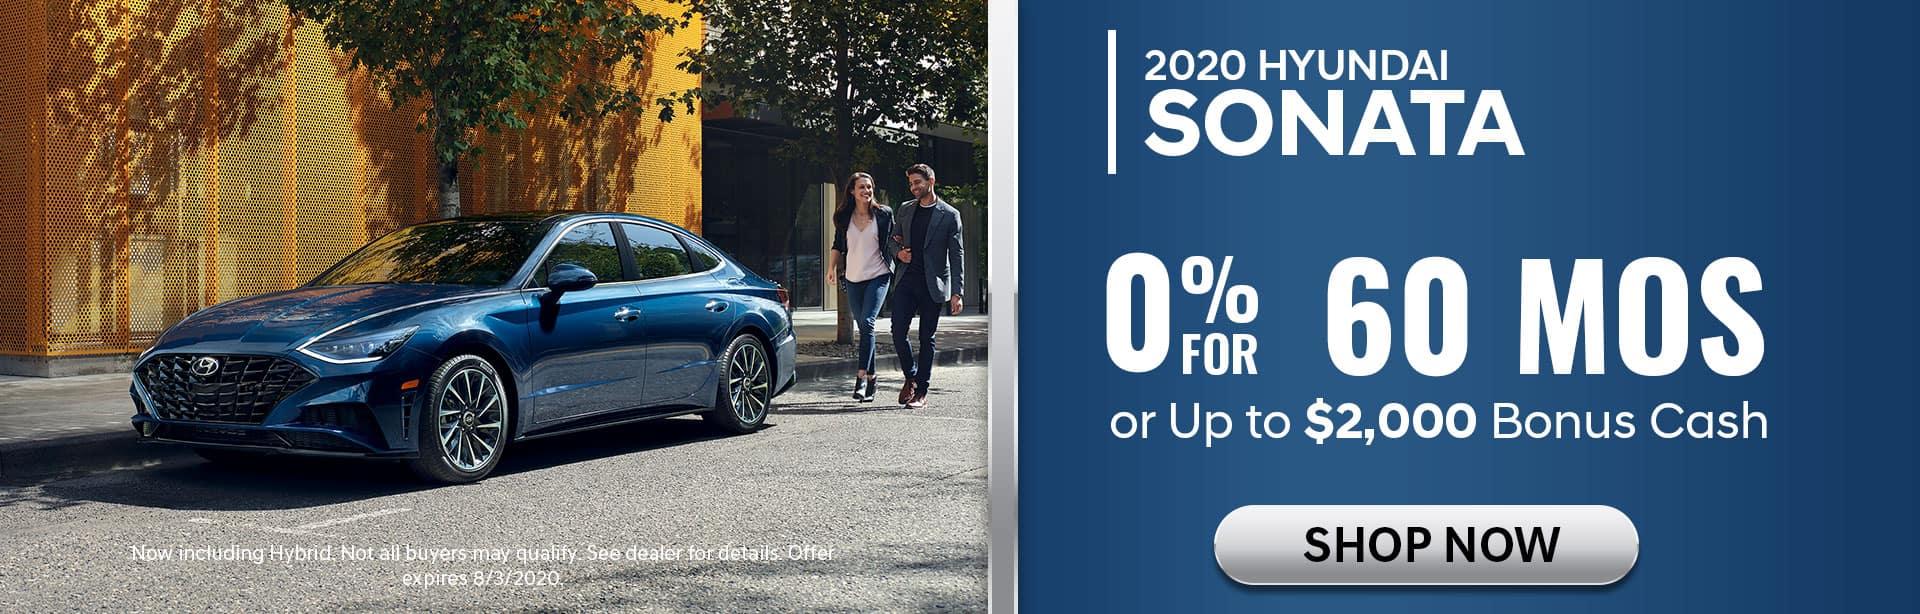 0% APR for 60 mos on 2020 Sonata